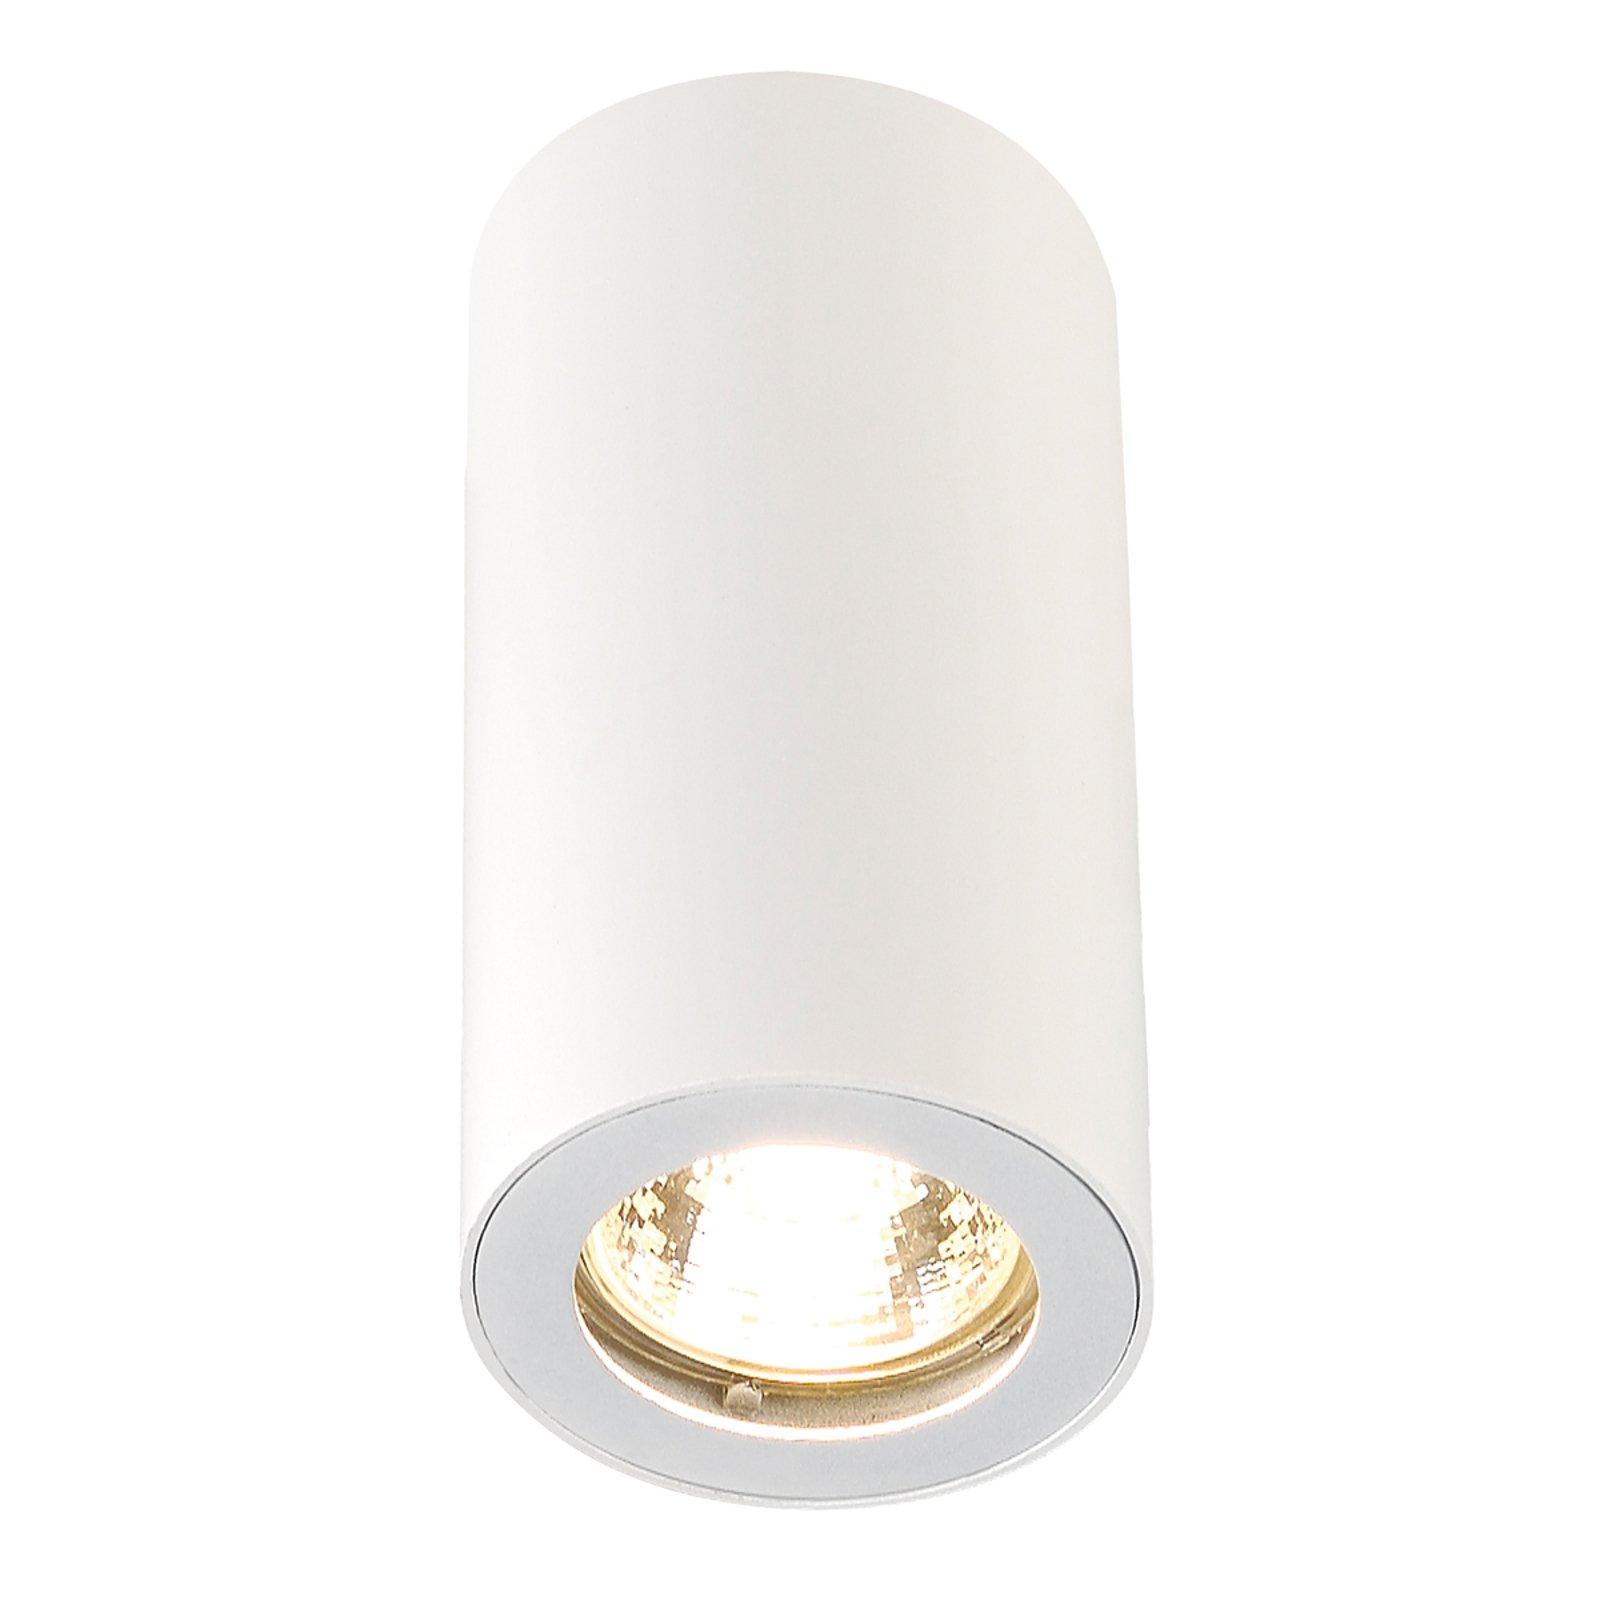 Hvit ENOLA_B CL-1 taklampe med ett lys